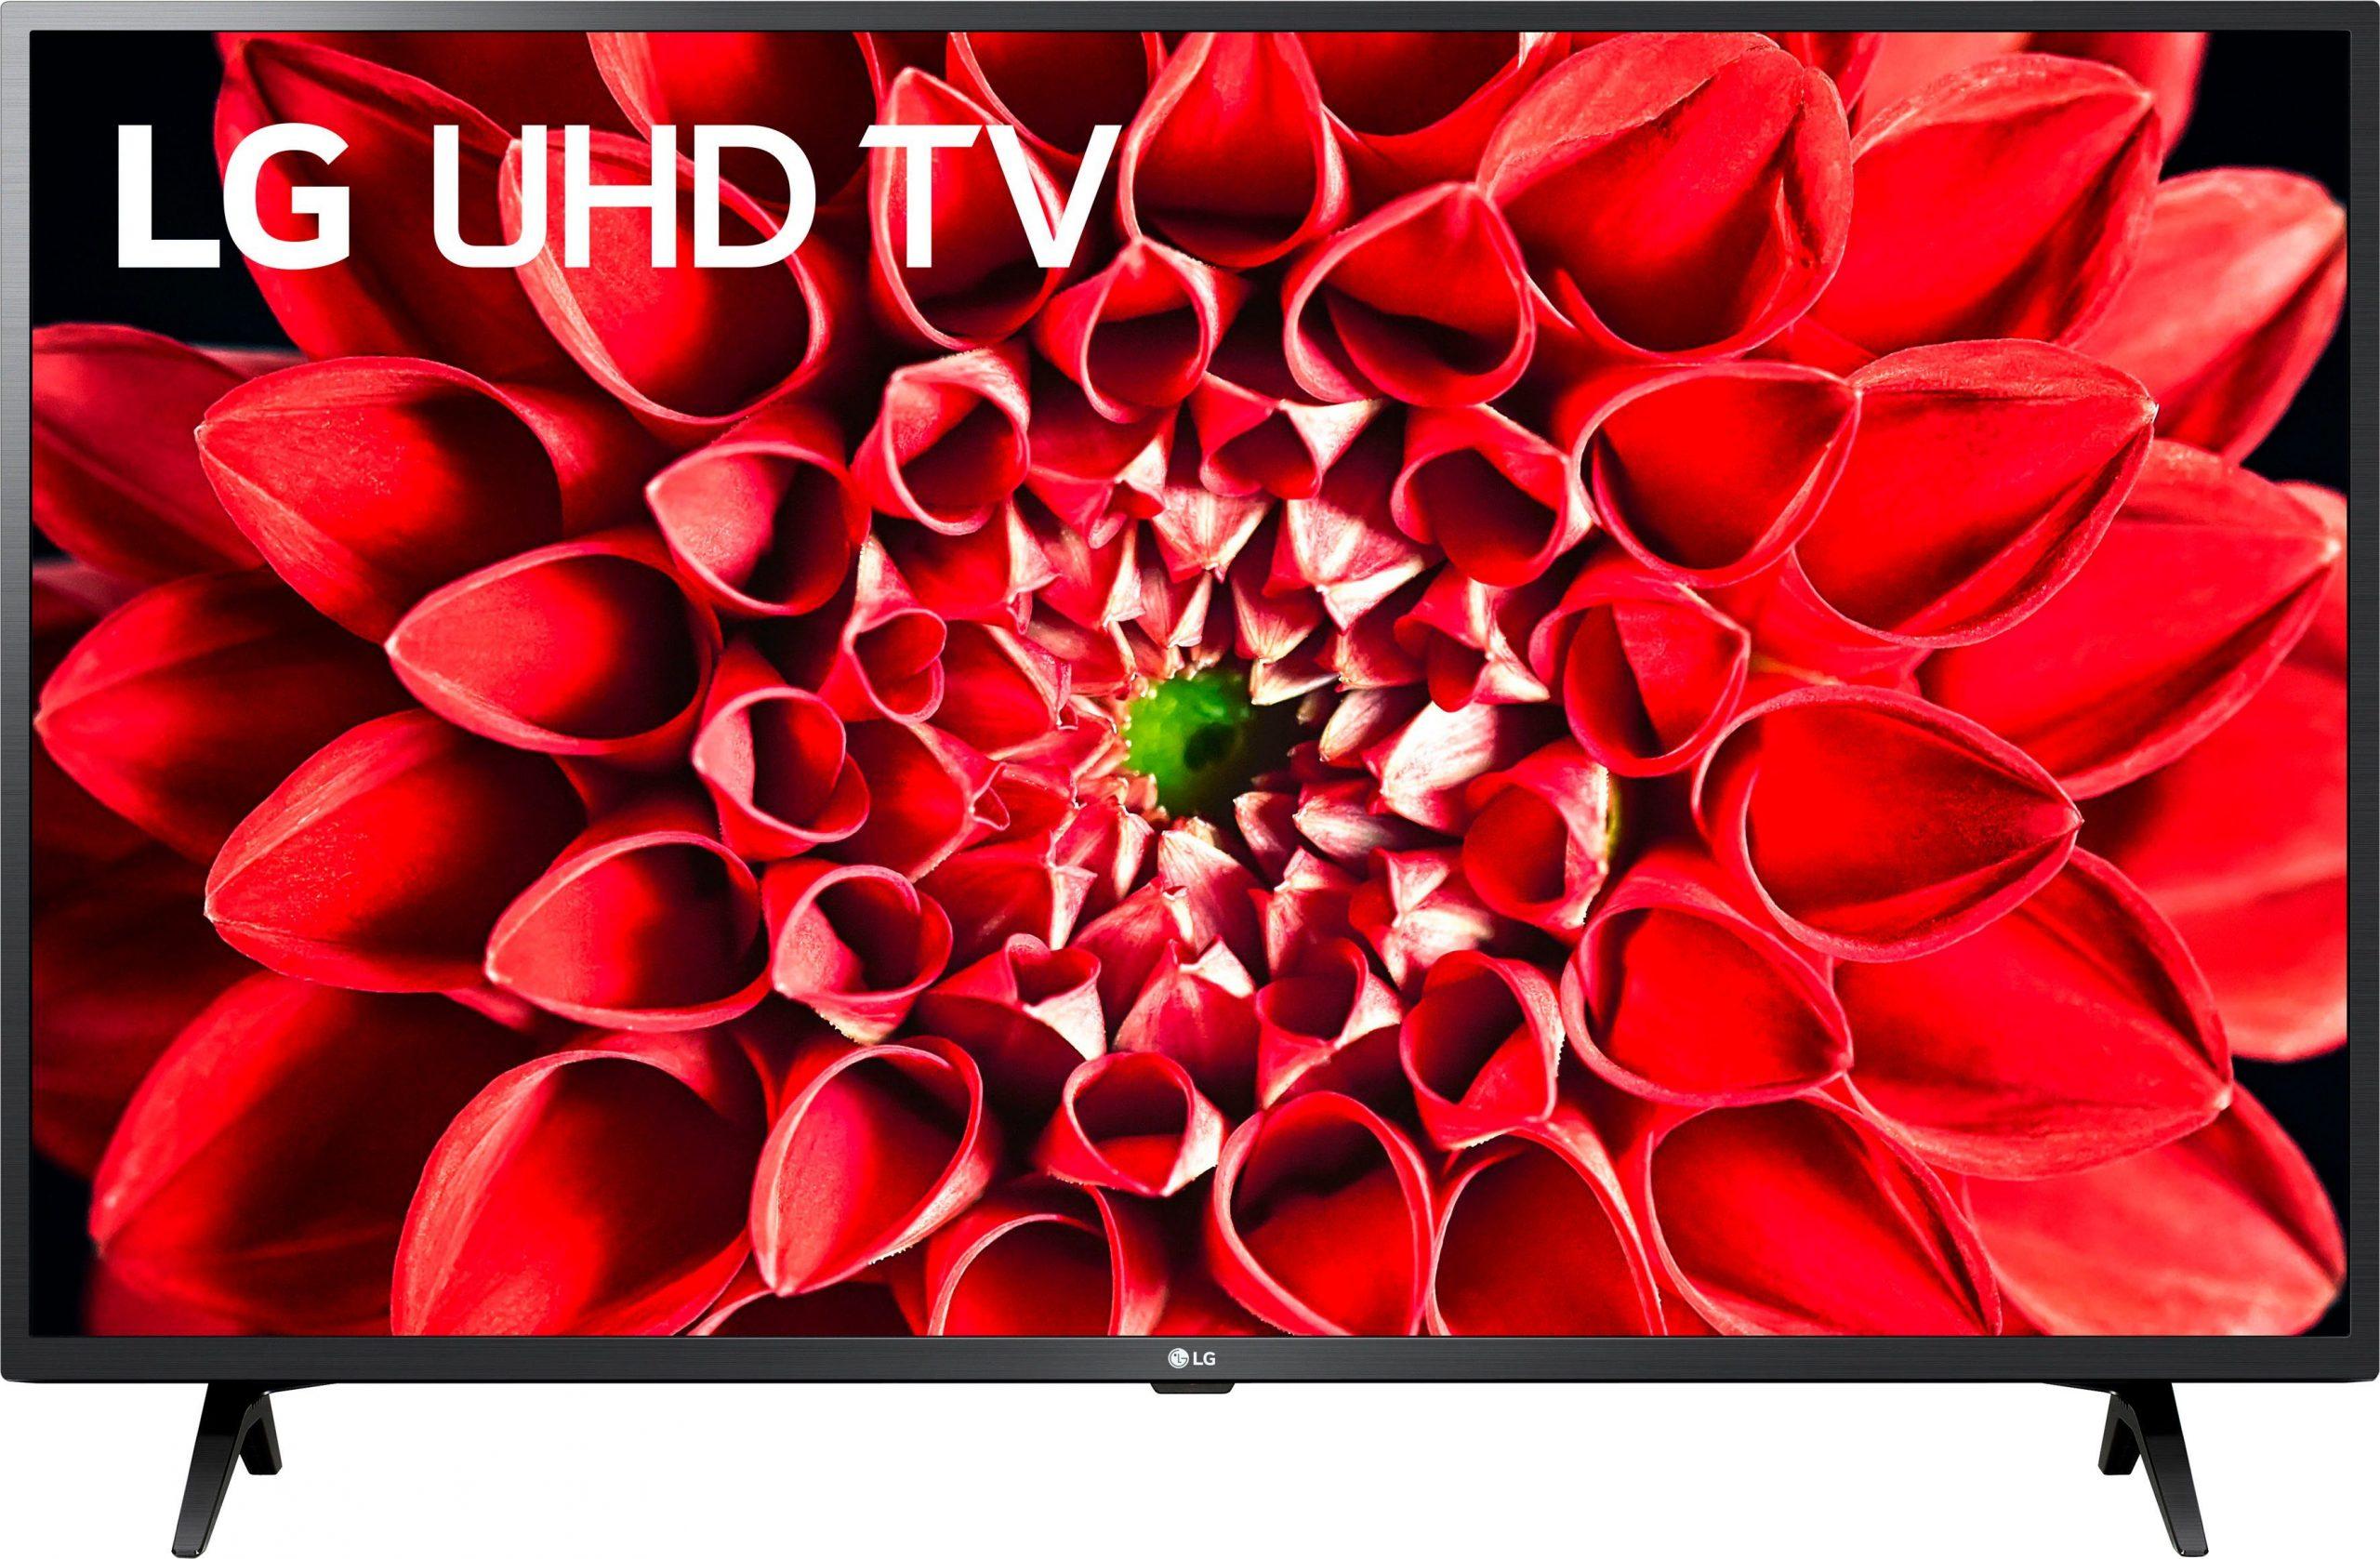 LG 50UN73006LA LED-televisie (126 cm / (50 Inch), 4K Ultra HD, Smart-TV